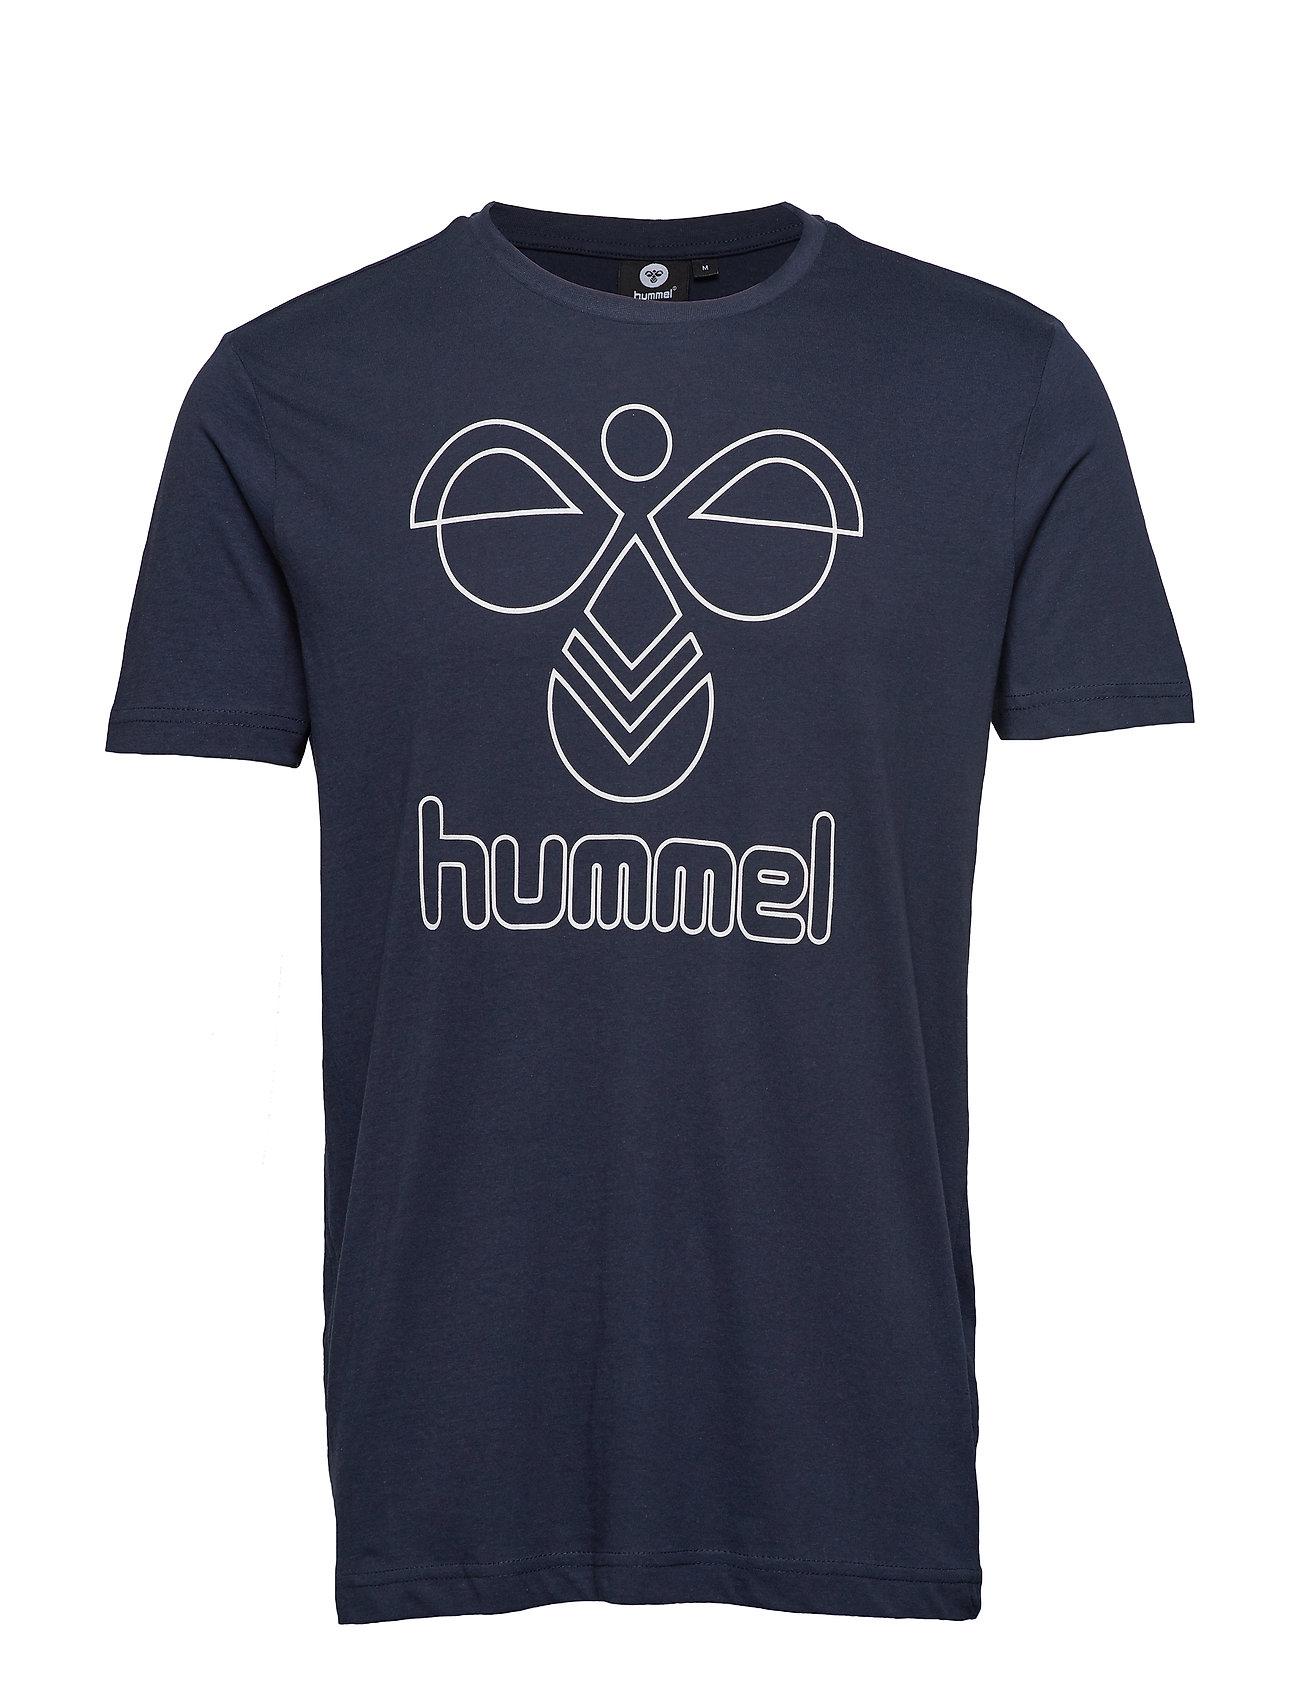 Hmlpeter sblack T shirt S IrisHummel 7gfybYvI6